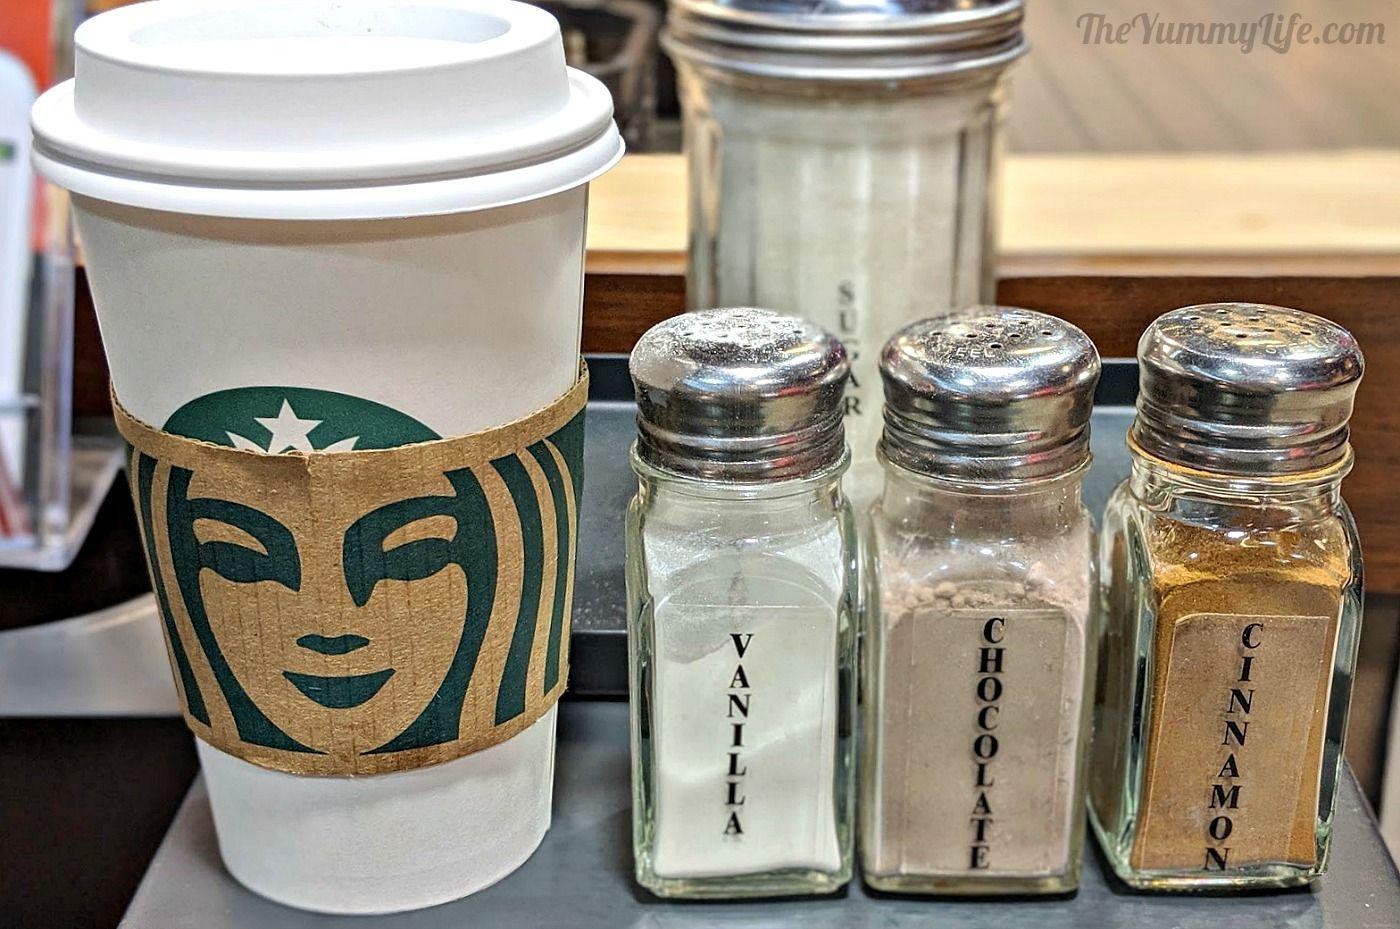 Homemade Vanilla Powder Recipe Vanilla Bean Powder Homemade Vanilla Tea Supplies